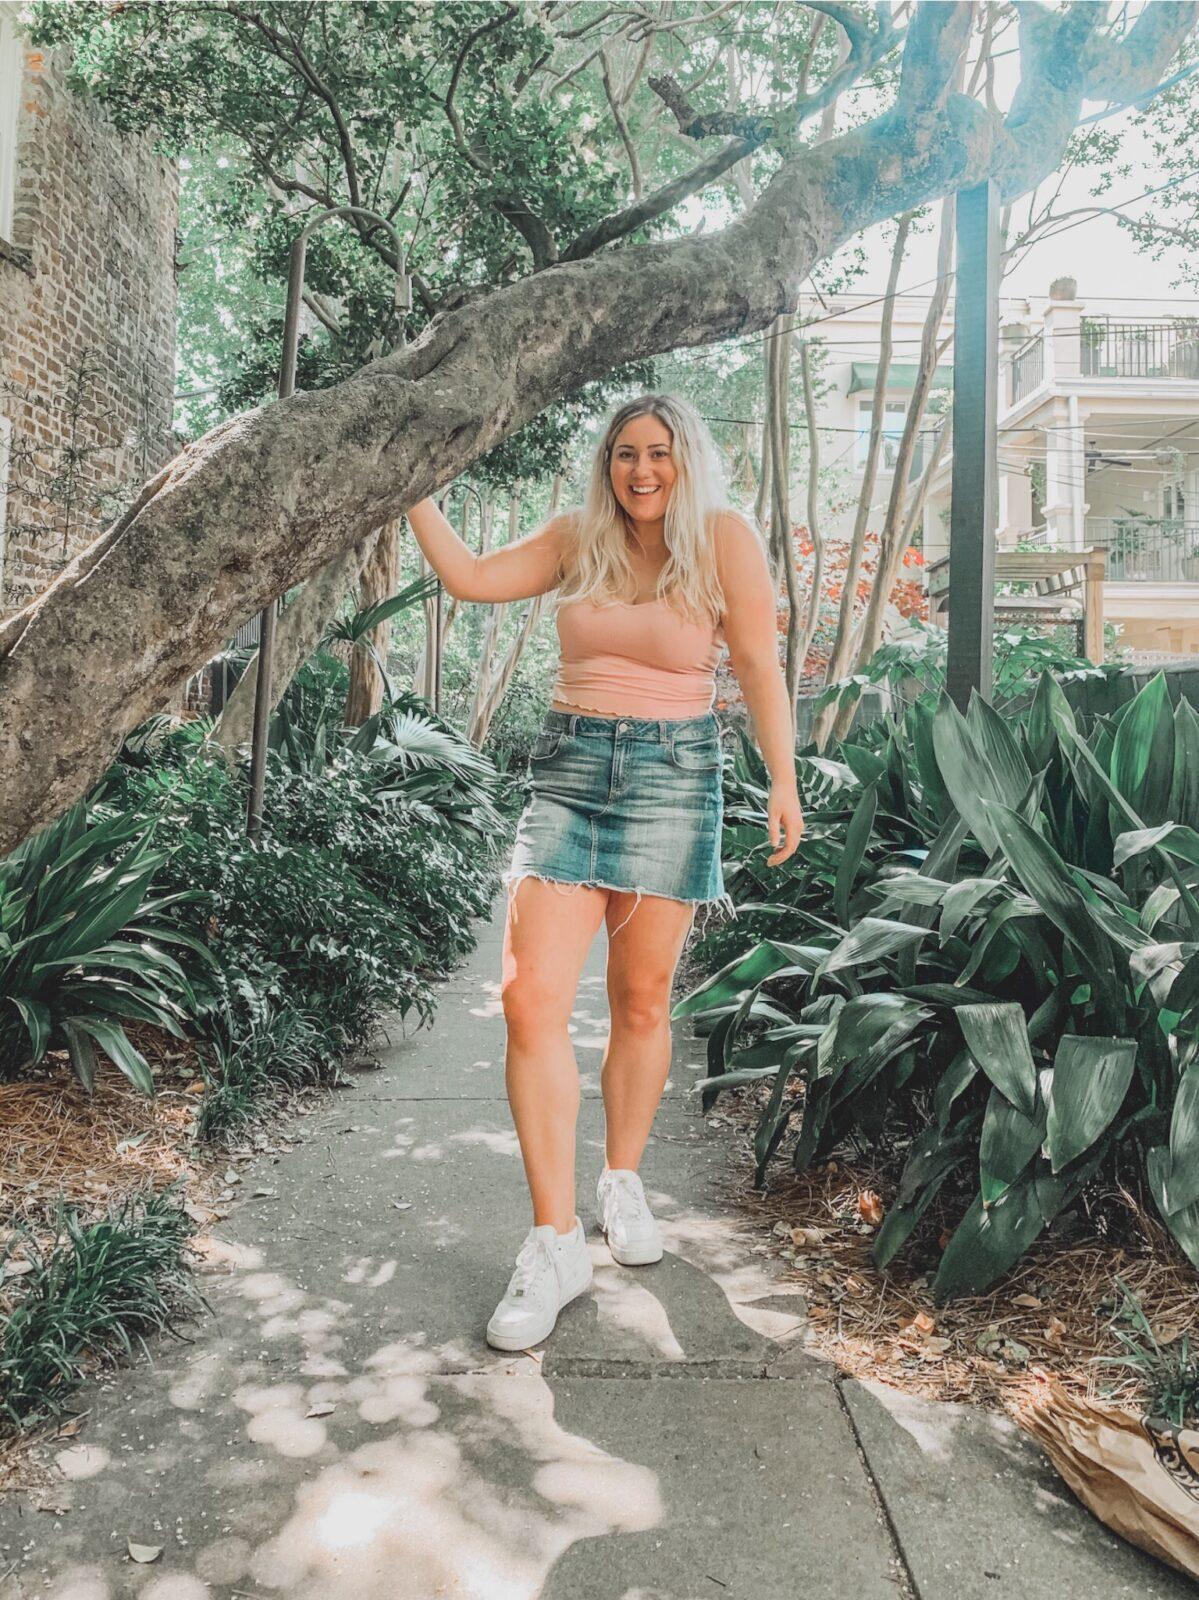 Alexa Carter- Kick Off Summer In Style